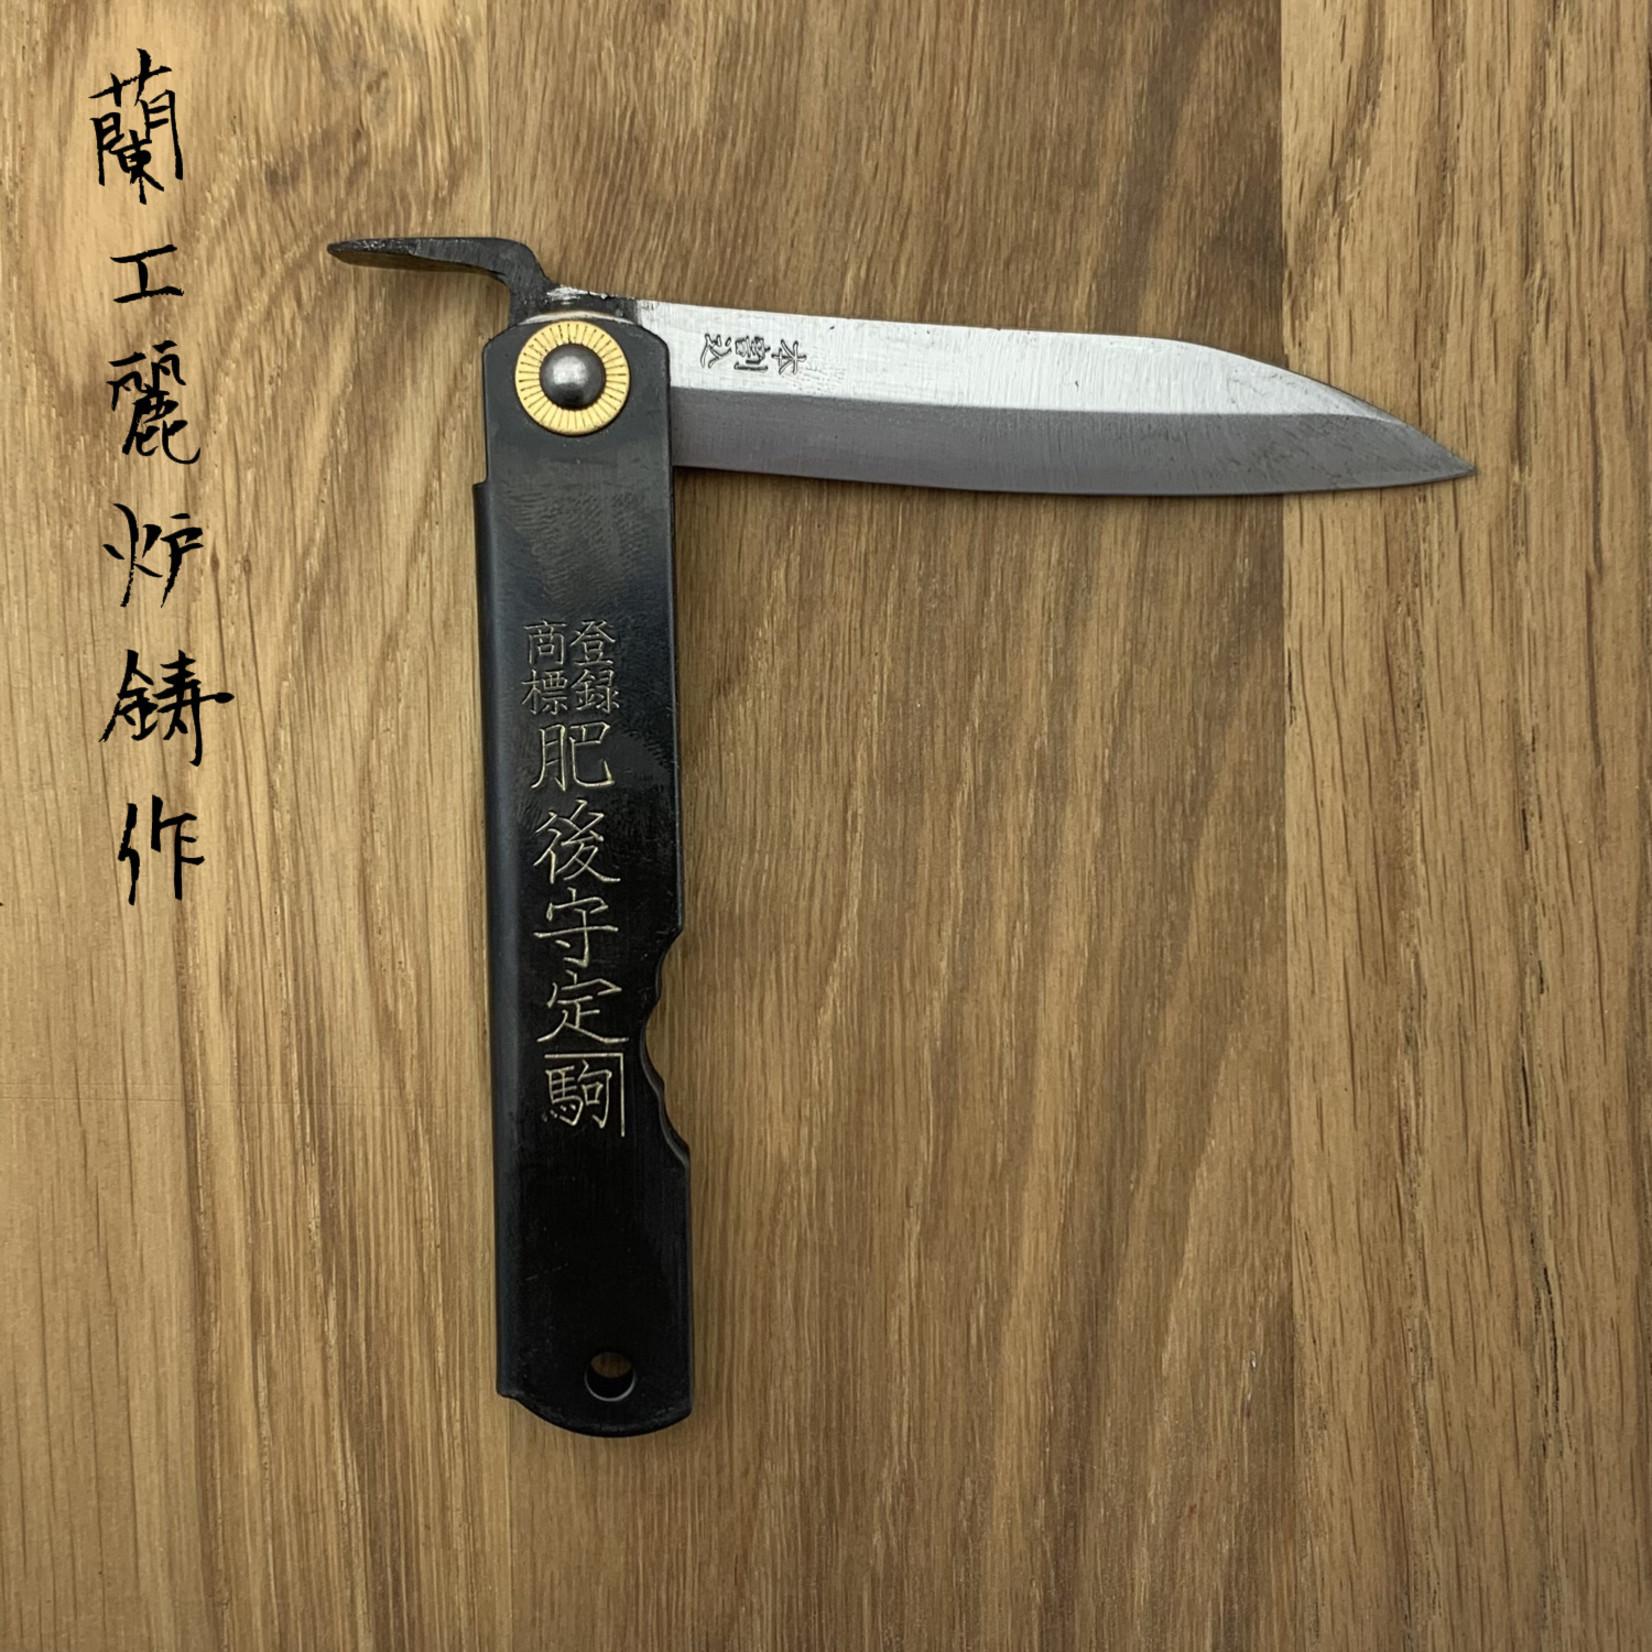 Higonokami Sasaba-Gata Blue steel kern 70 mm Zwart 12BK